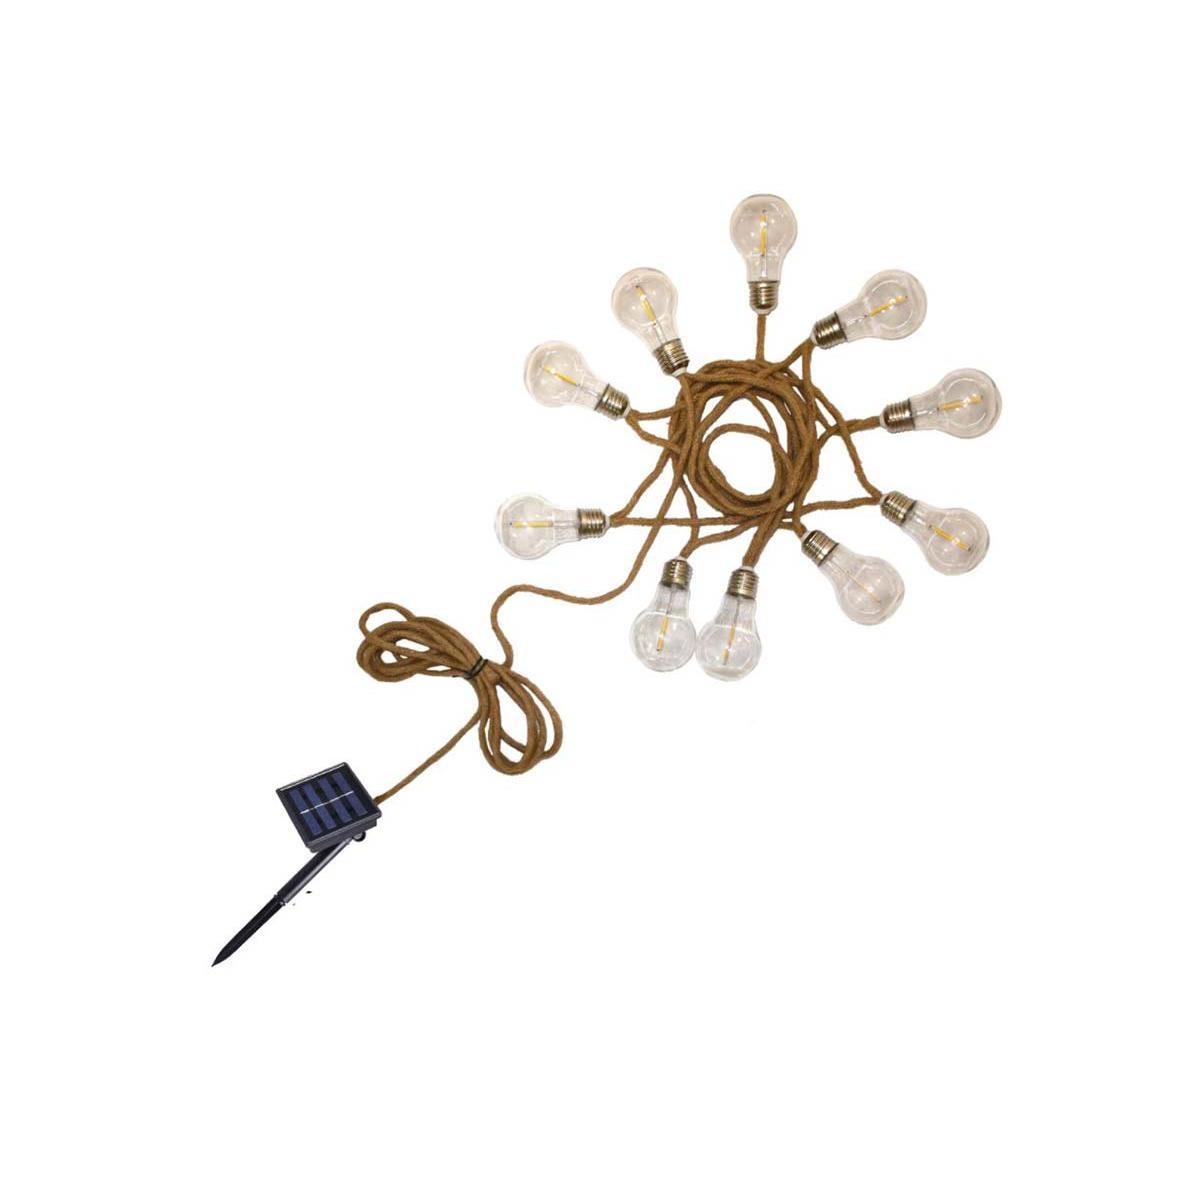 Lumisky Guirlande lumineuse solaire en corde 10 ampoules transparentes LED blanc chaud FANTASY CORD SOLAR 7,45 m